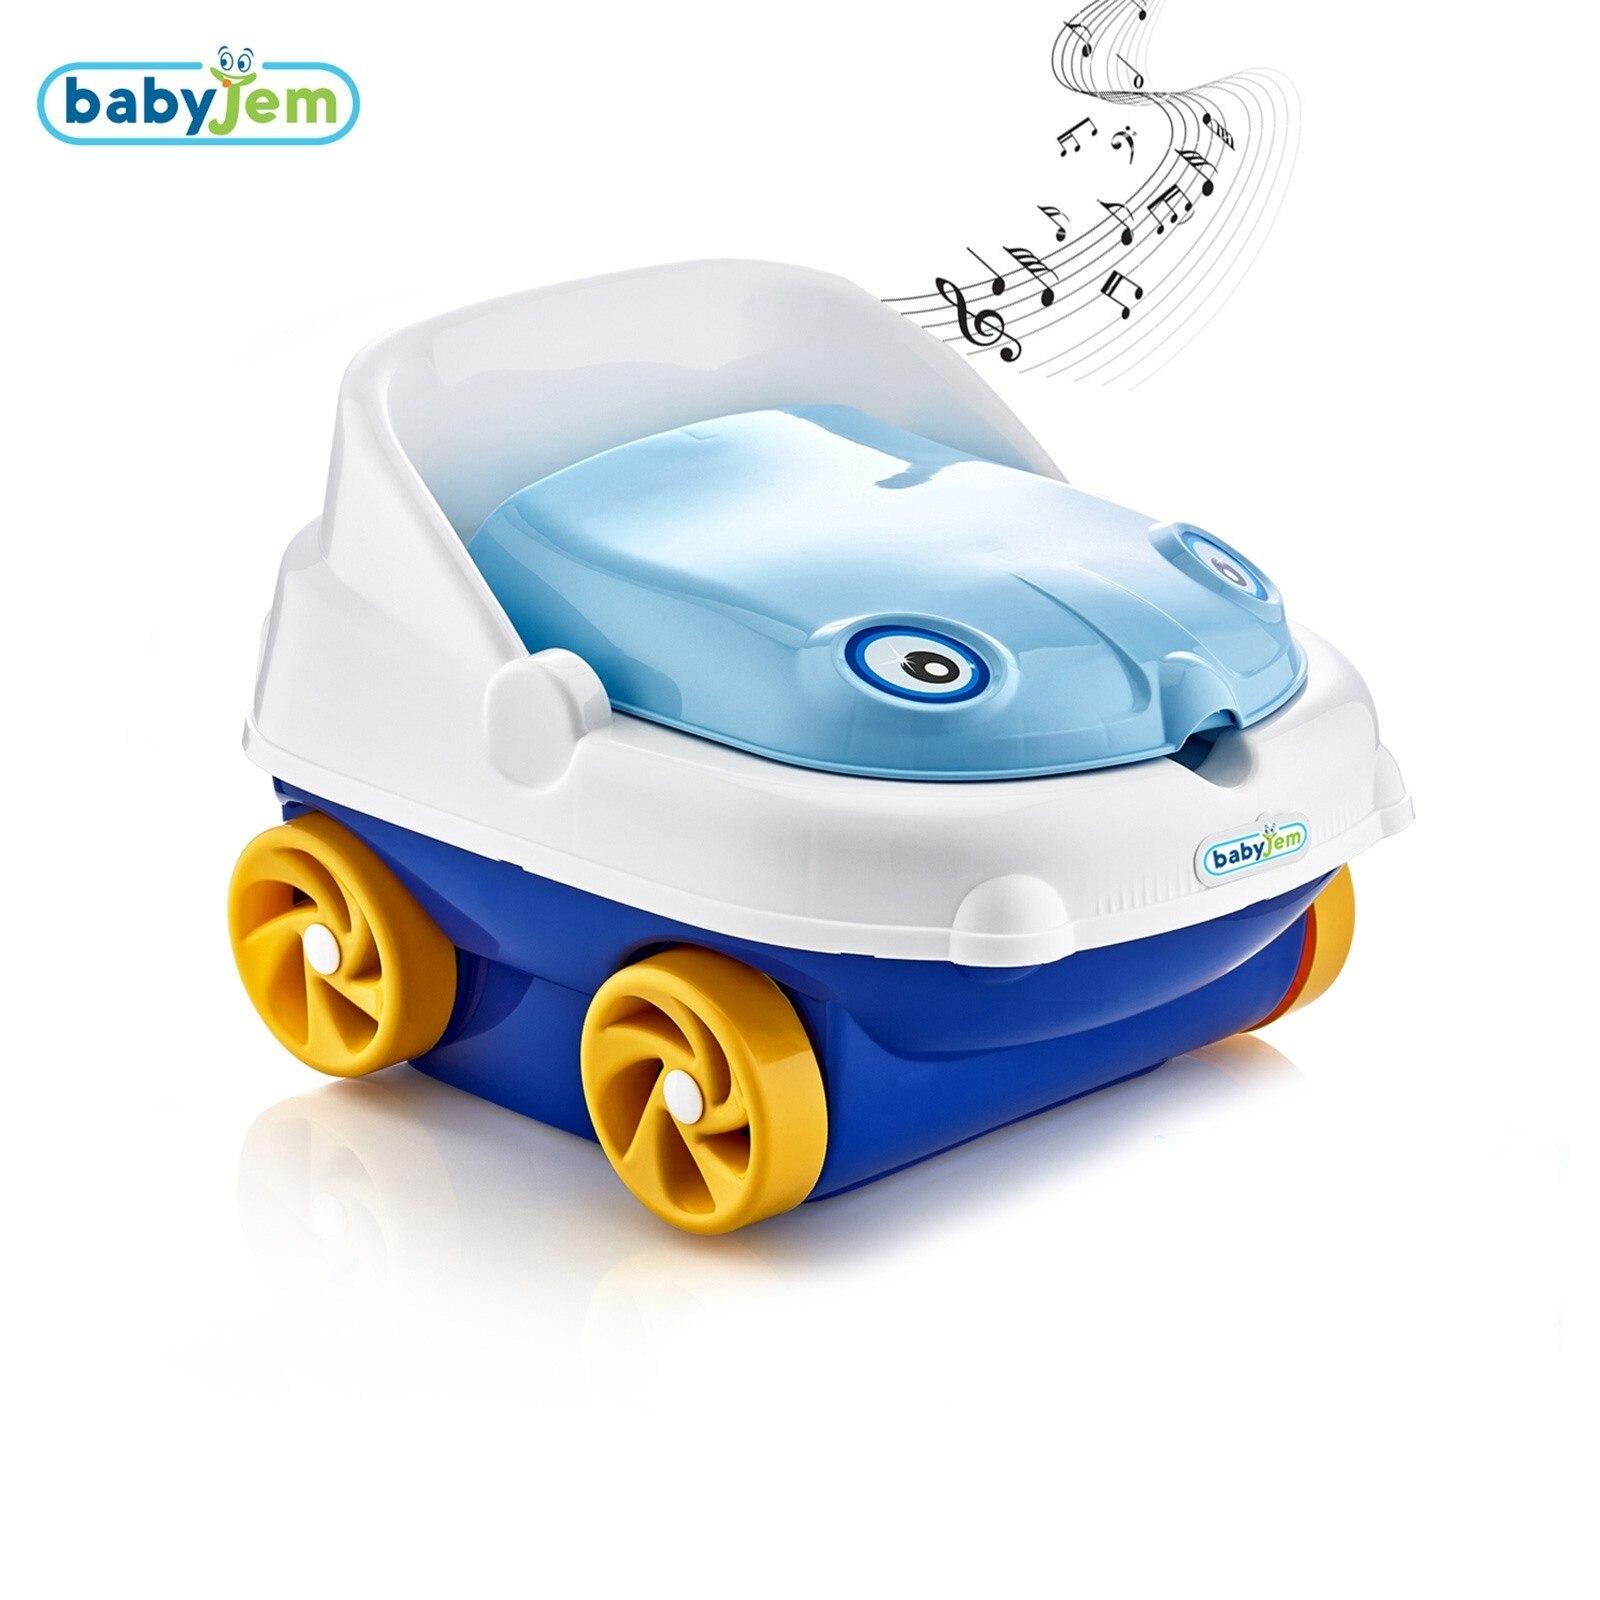 Ebebek Babyjem Lux Musical Baby Training Potty